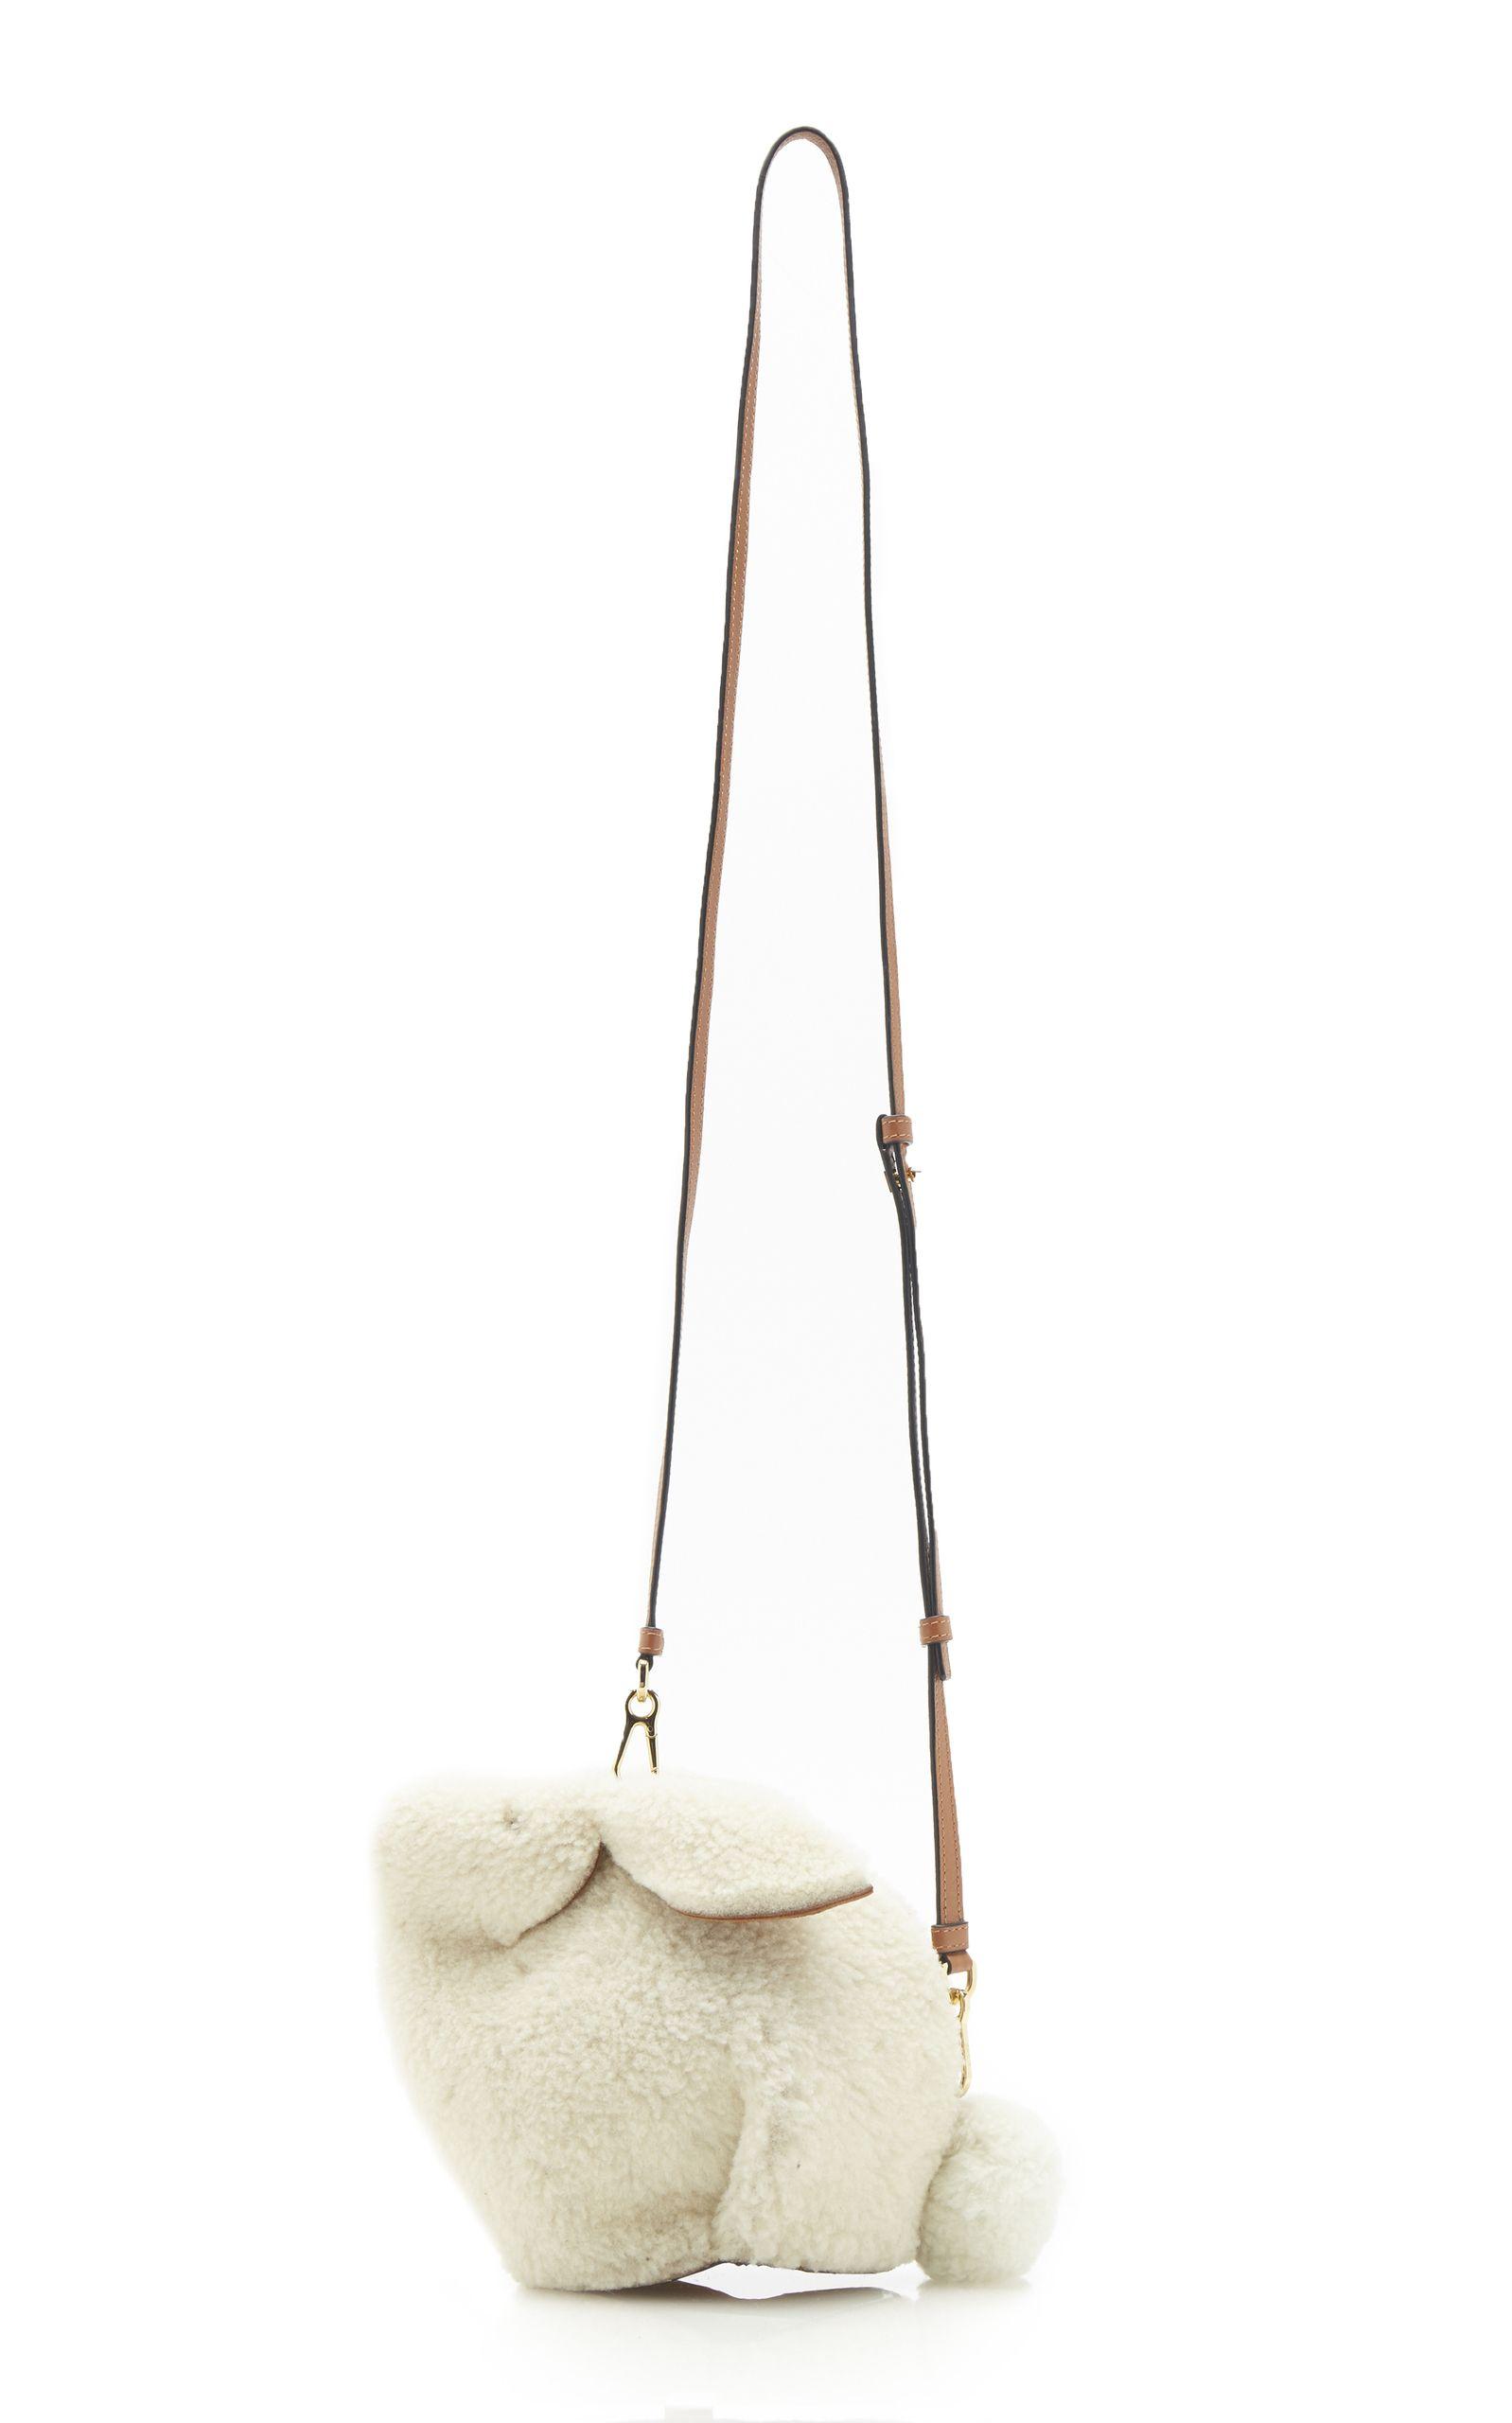 Available By Mini Shearling Crossbody On Now Bunny Loewe Bag Moda q1Rn4aIn0